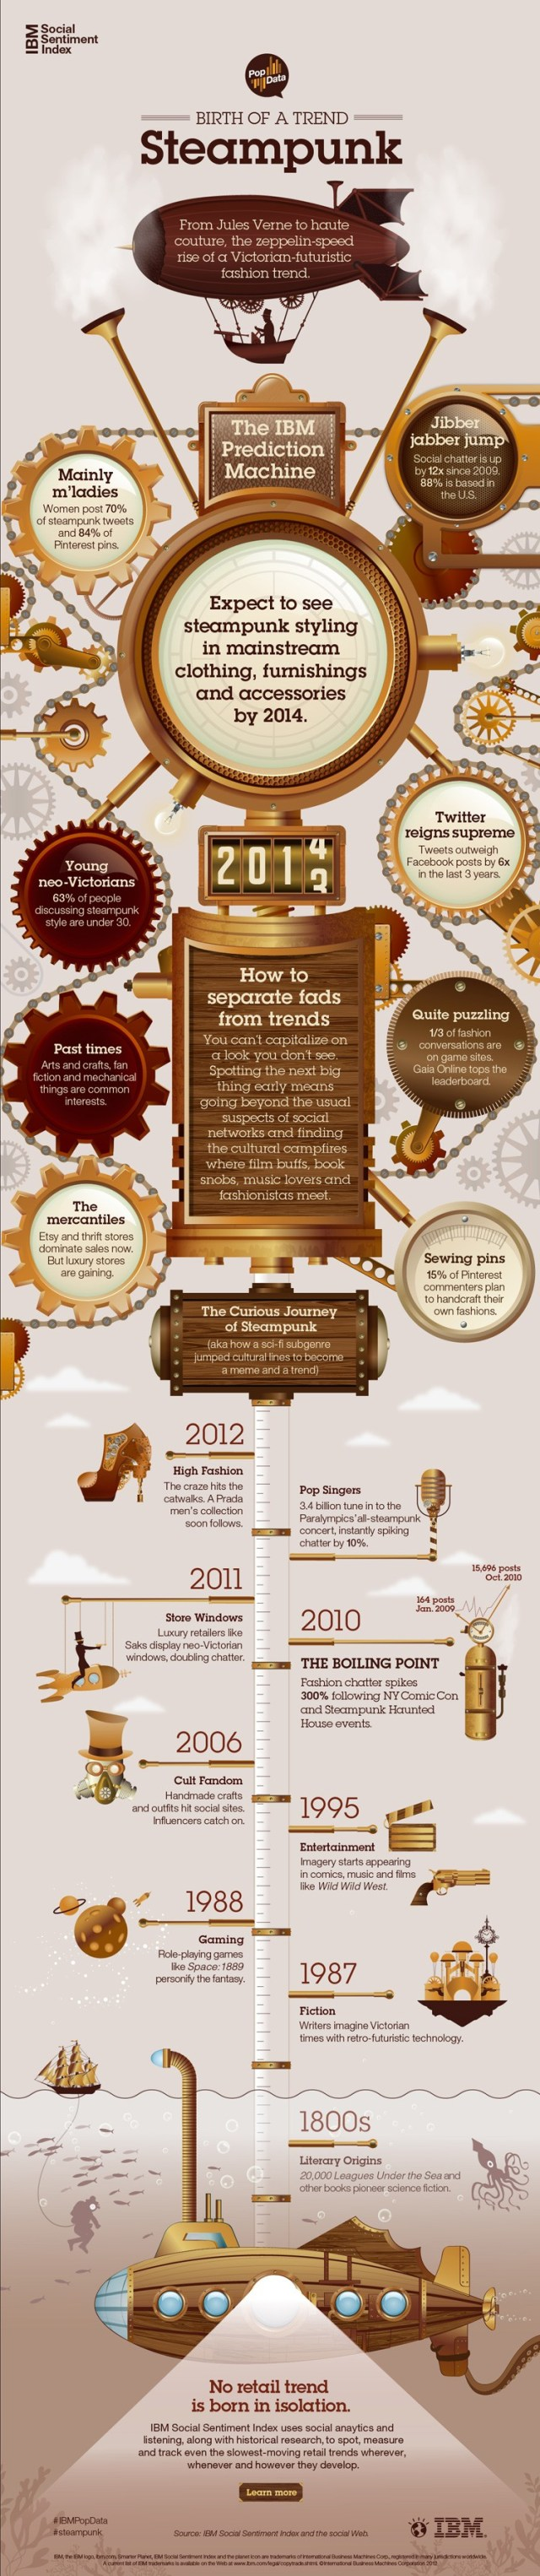 IBM Social Sentiment Index Birth of a Trend: Steampunk